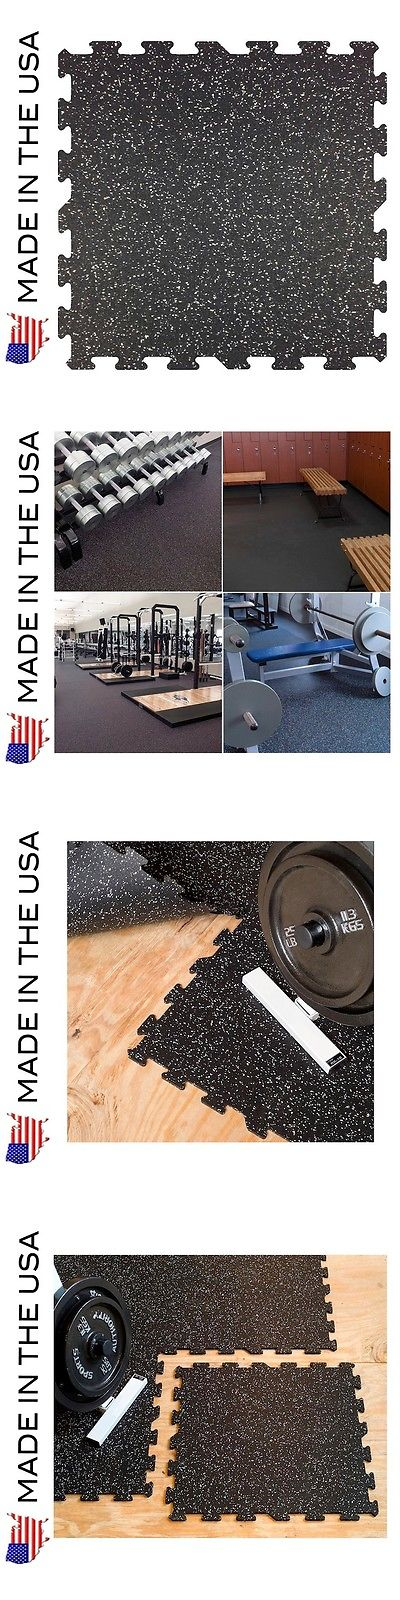 Exercise Mats 44079 Rubber Flooring Gym Tiles - 5/16 (8Mm) - 9 Pack